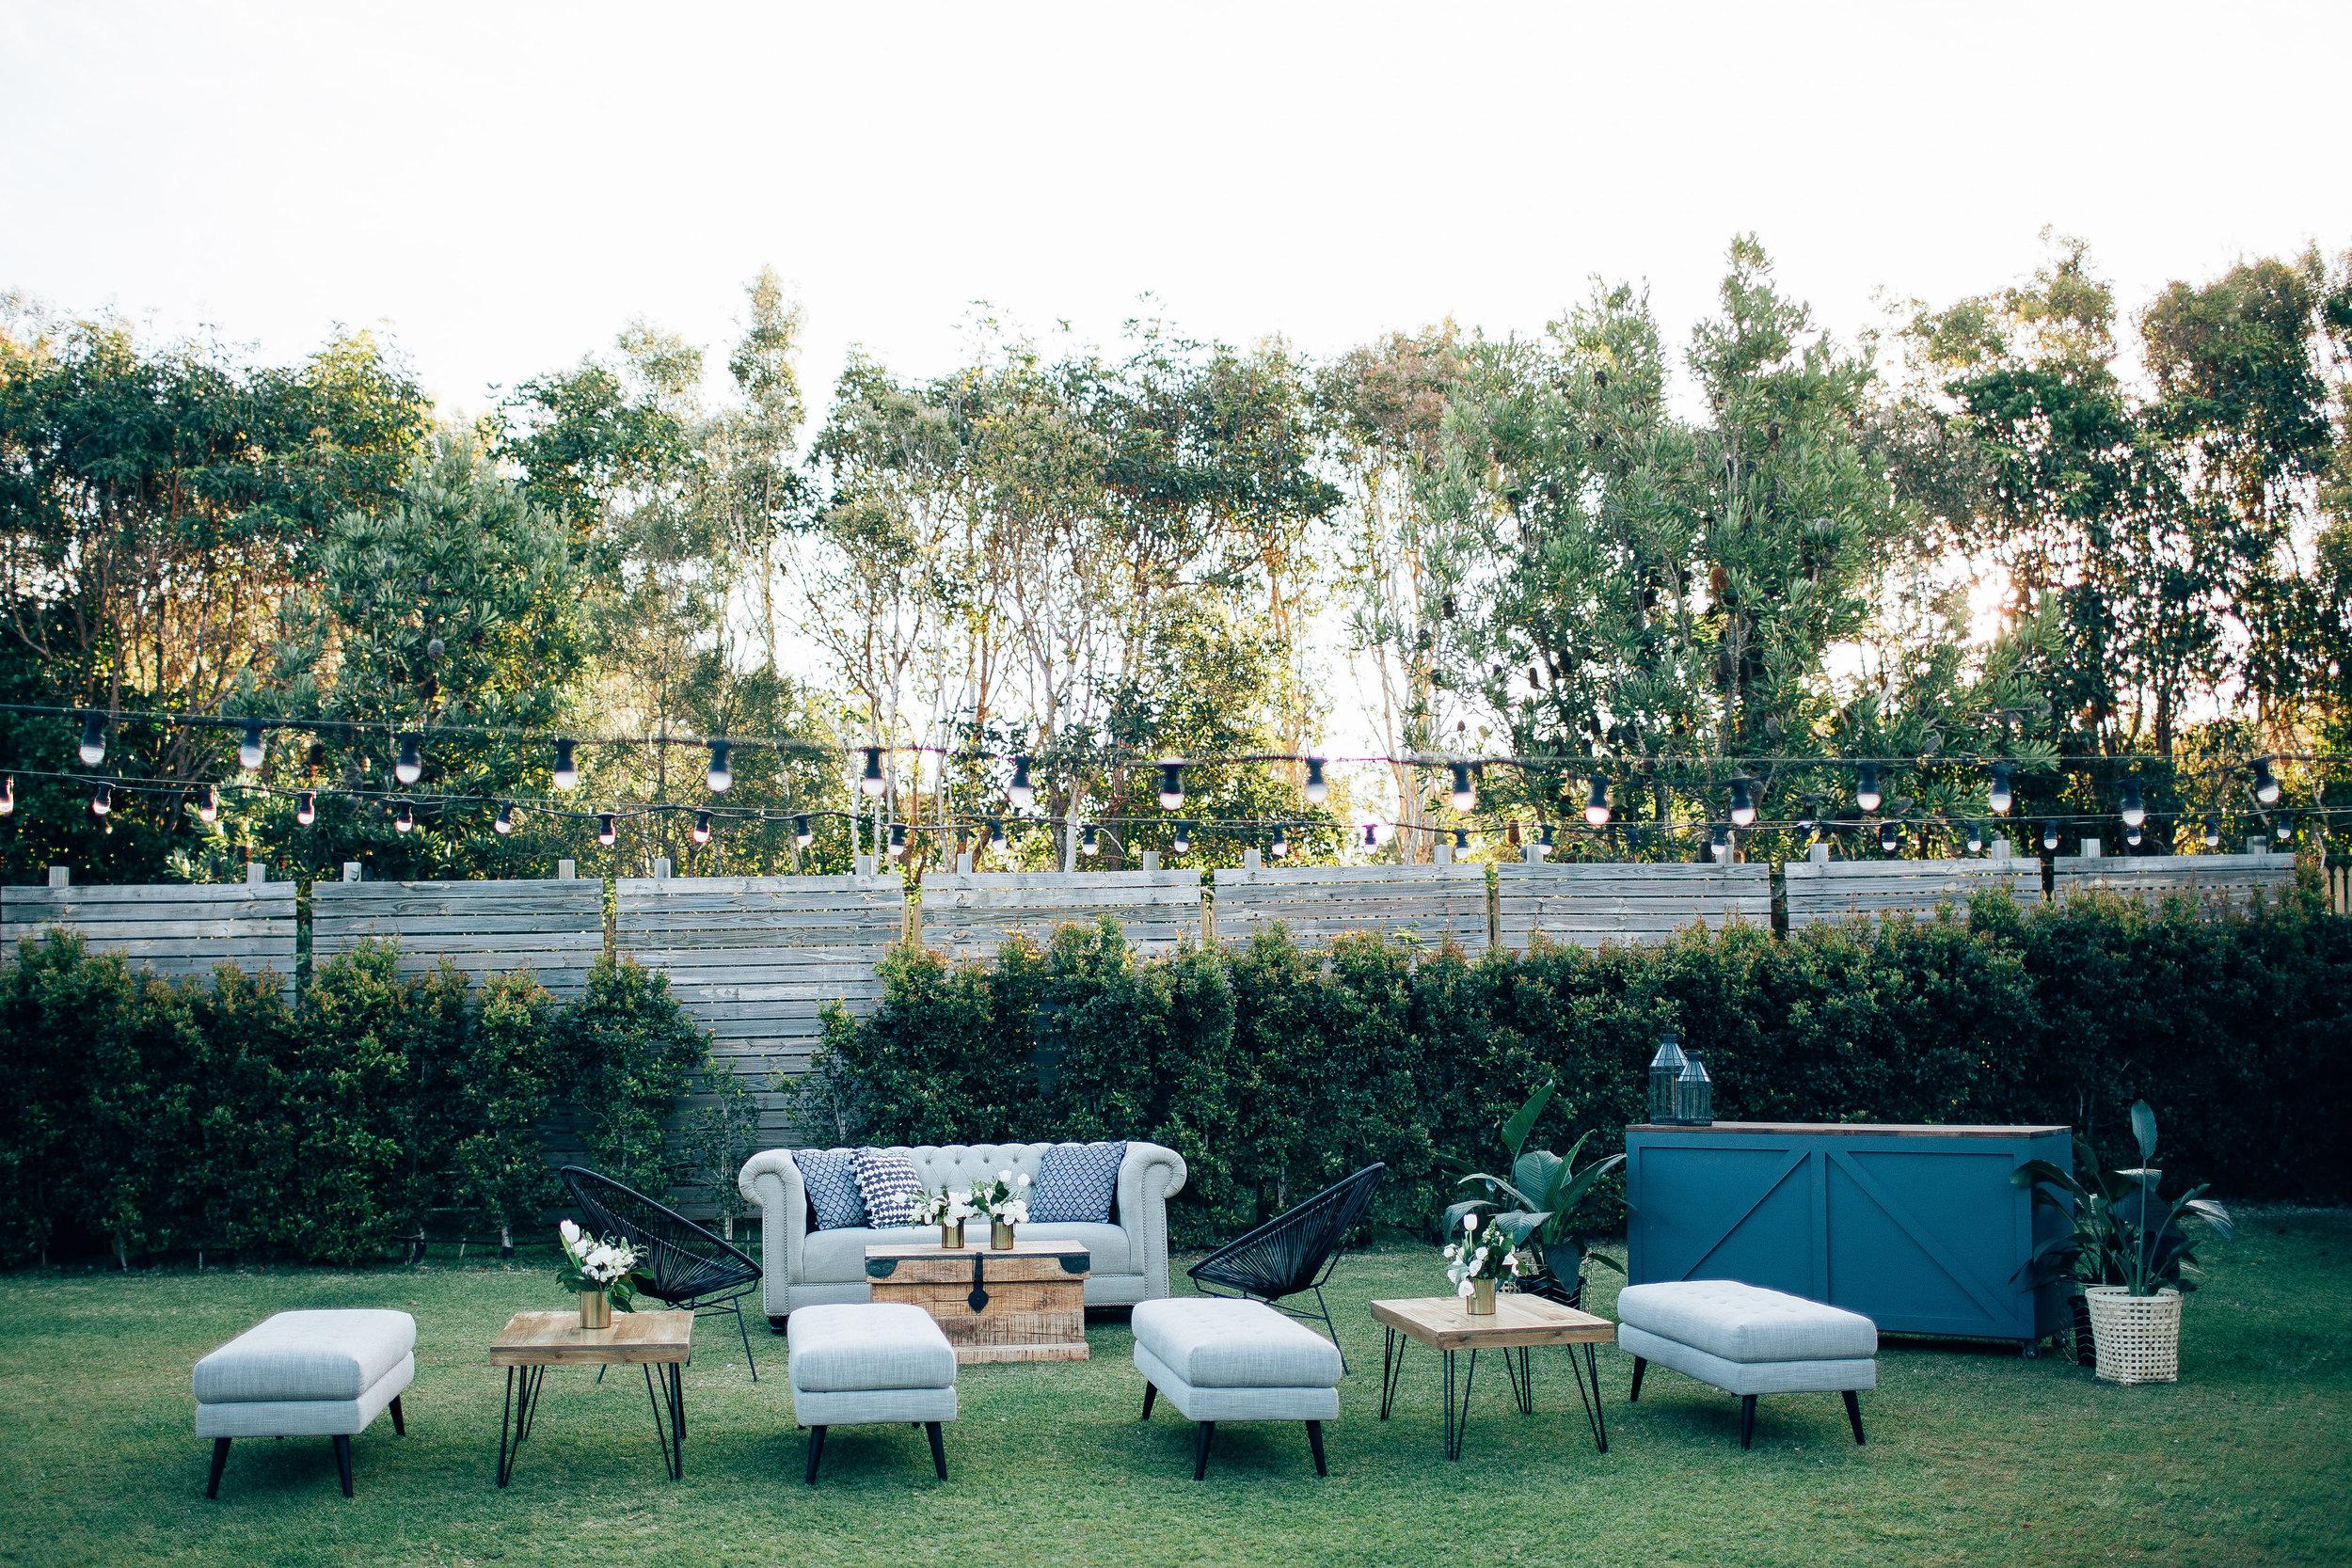 Cocktail Wedding Furniture Tips | Hampton Event Hire - Wedding & Event Hire | www.hamptoneventhire,com | Servicing Brisbane, Gold Coast and Byron Bay